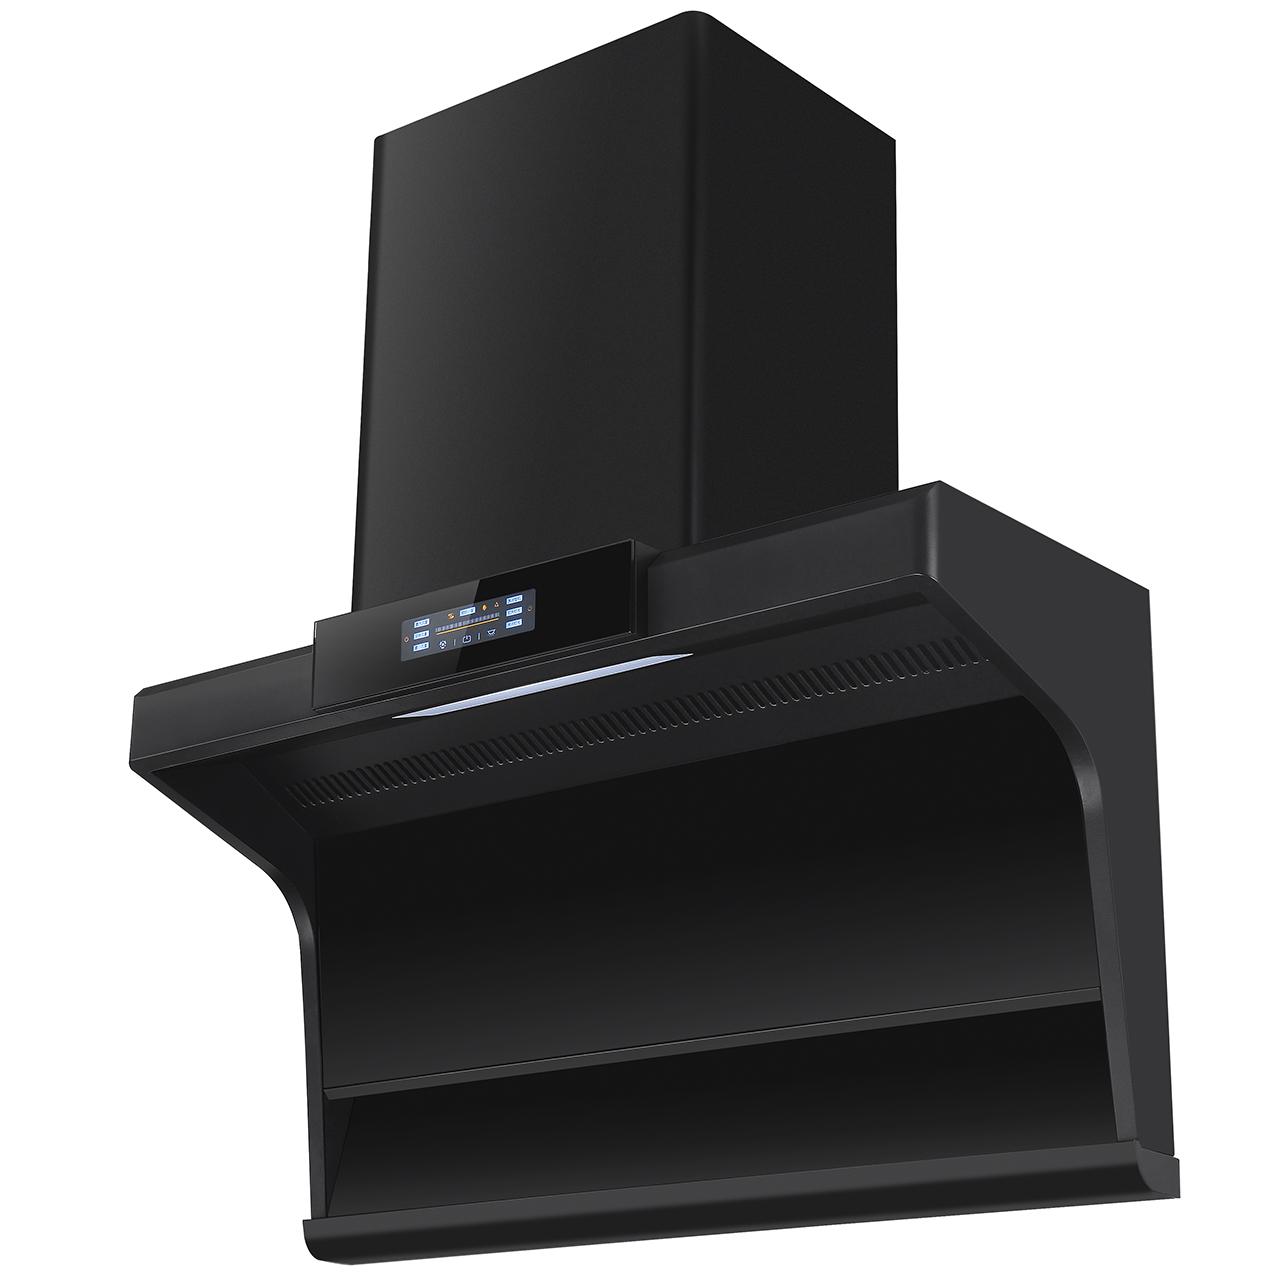 088A1喷涂黑高档厨房烟机,七字型厨房烟机